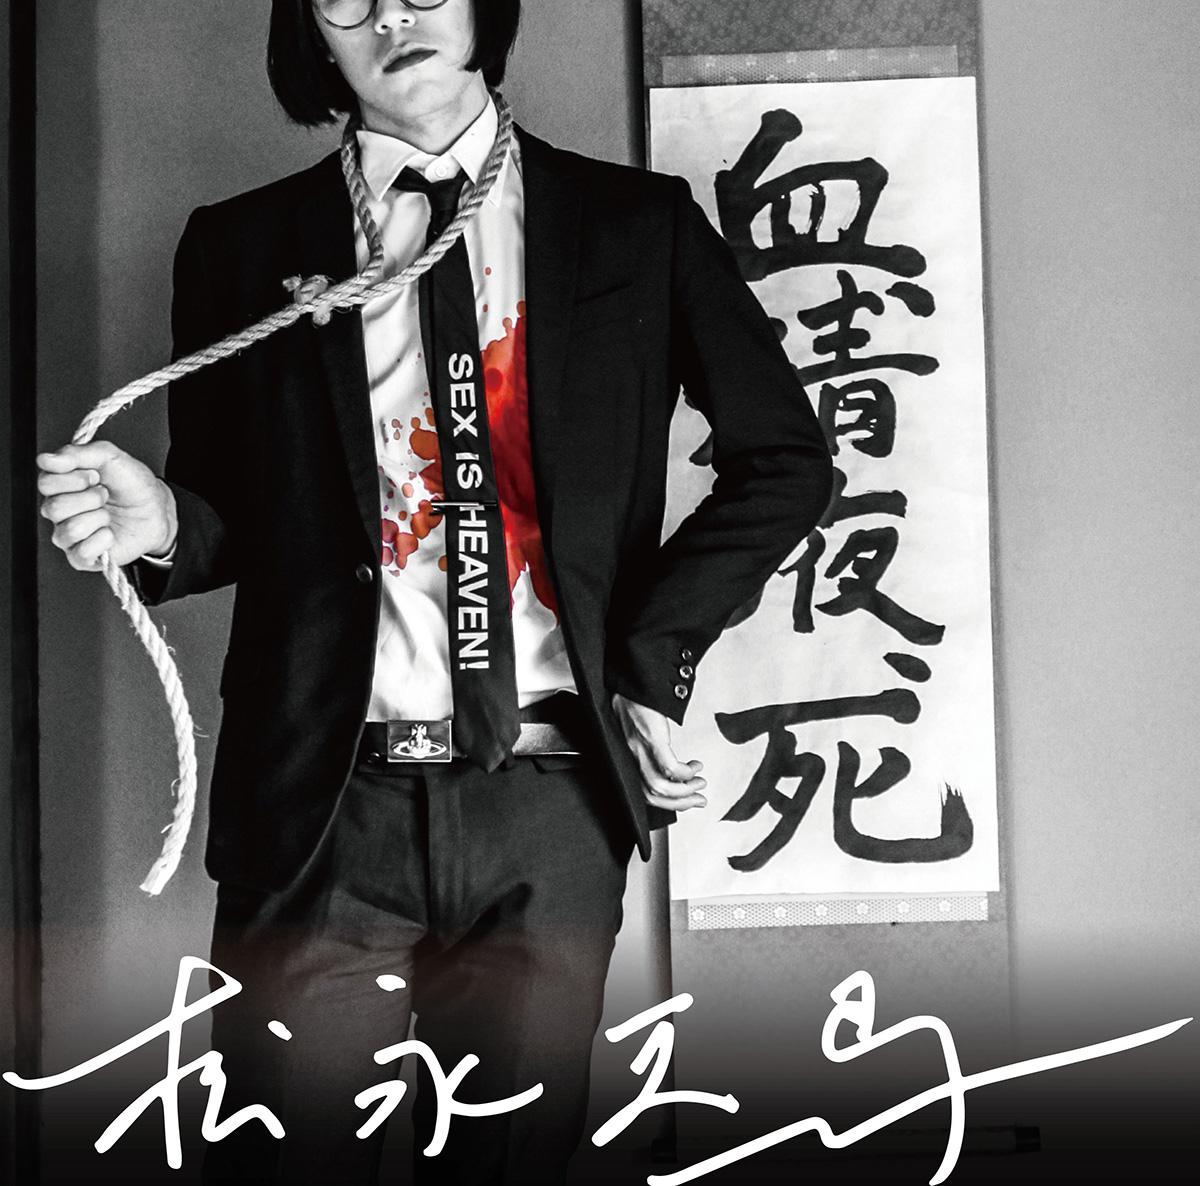 JRock247-URBANGARDE-Temma-Matsunaga-CD-limited